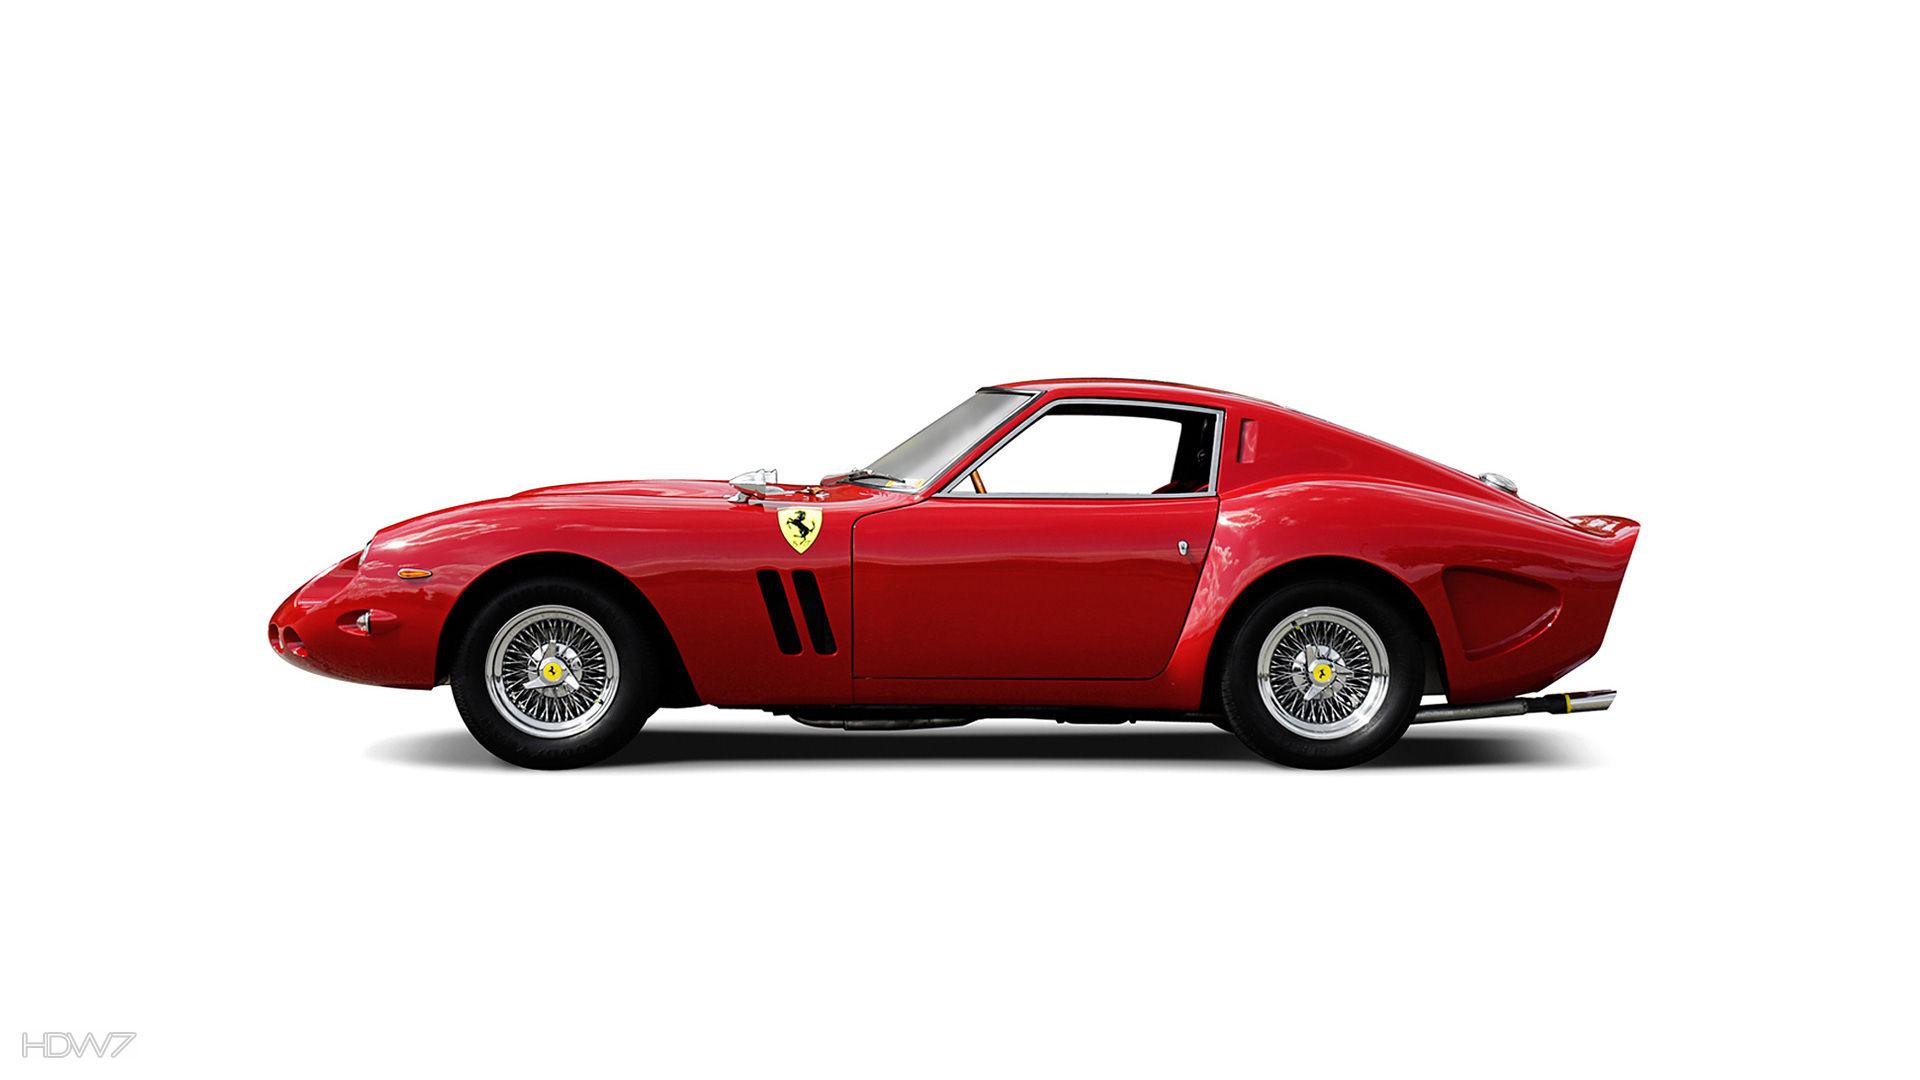 Ferrari 250 Gto Wallpapers: Ferrari 250 GTO Wallpaper 19